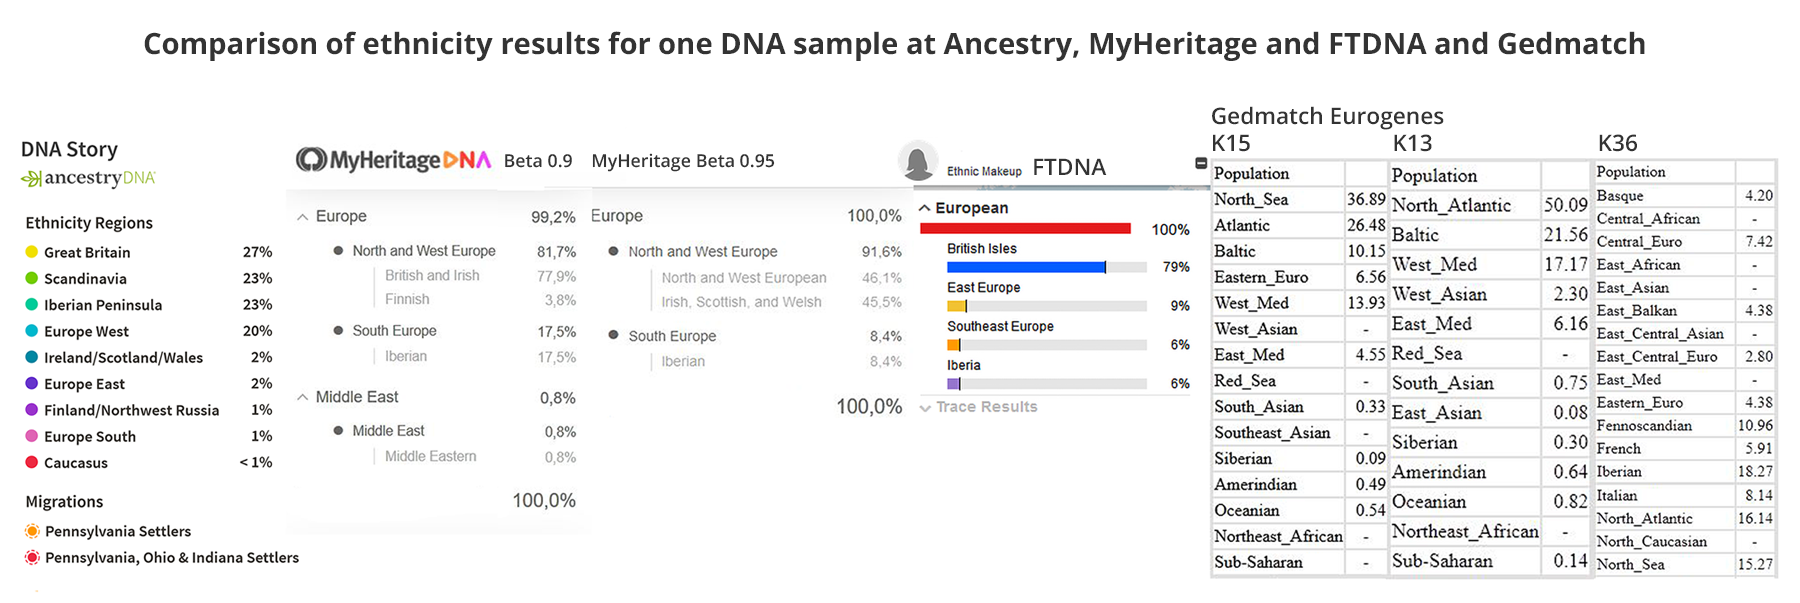 ethnicity comparison